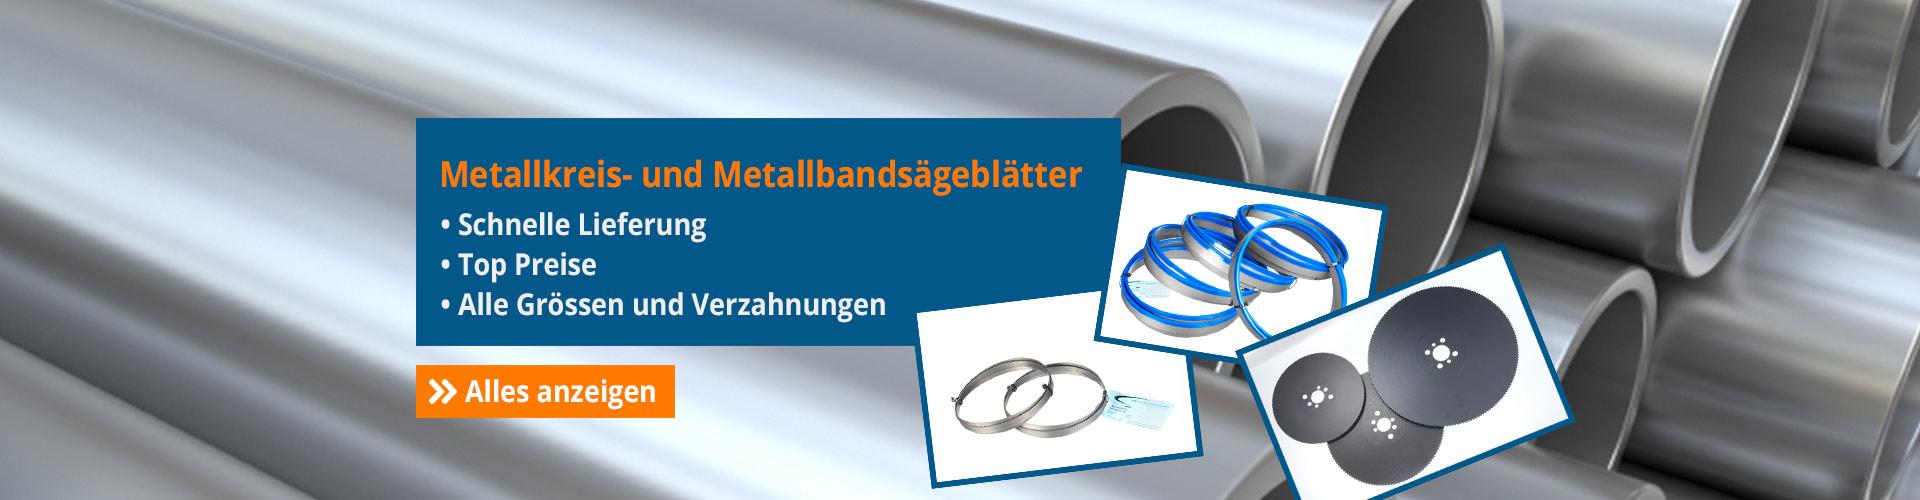 Metallkreis- und Metallbandsägeblätter